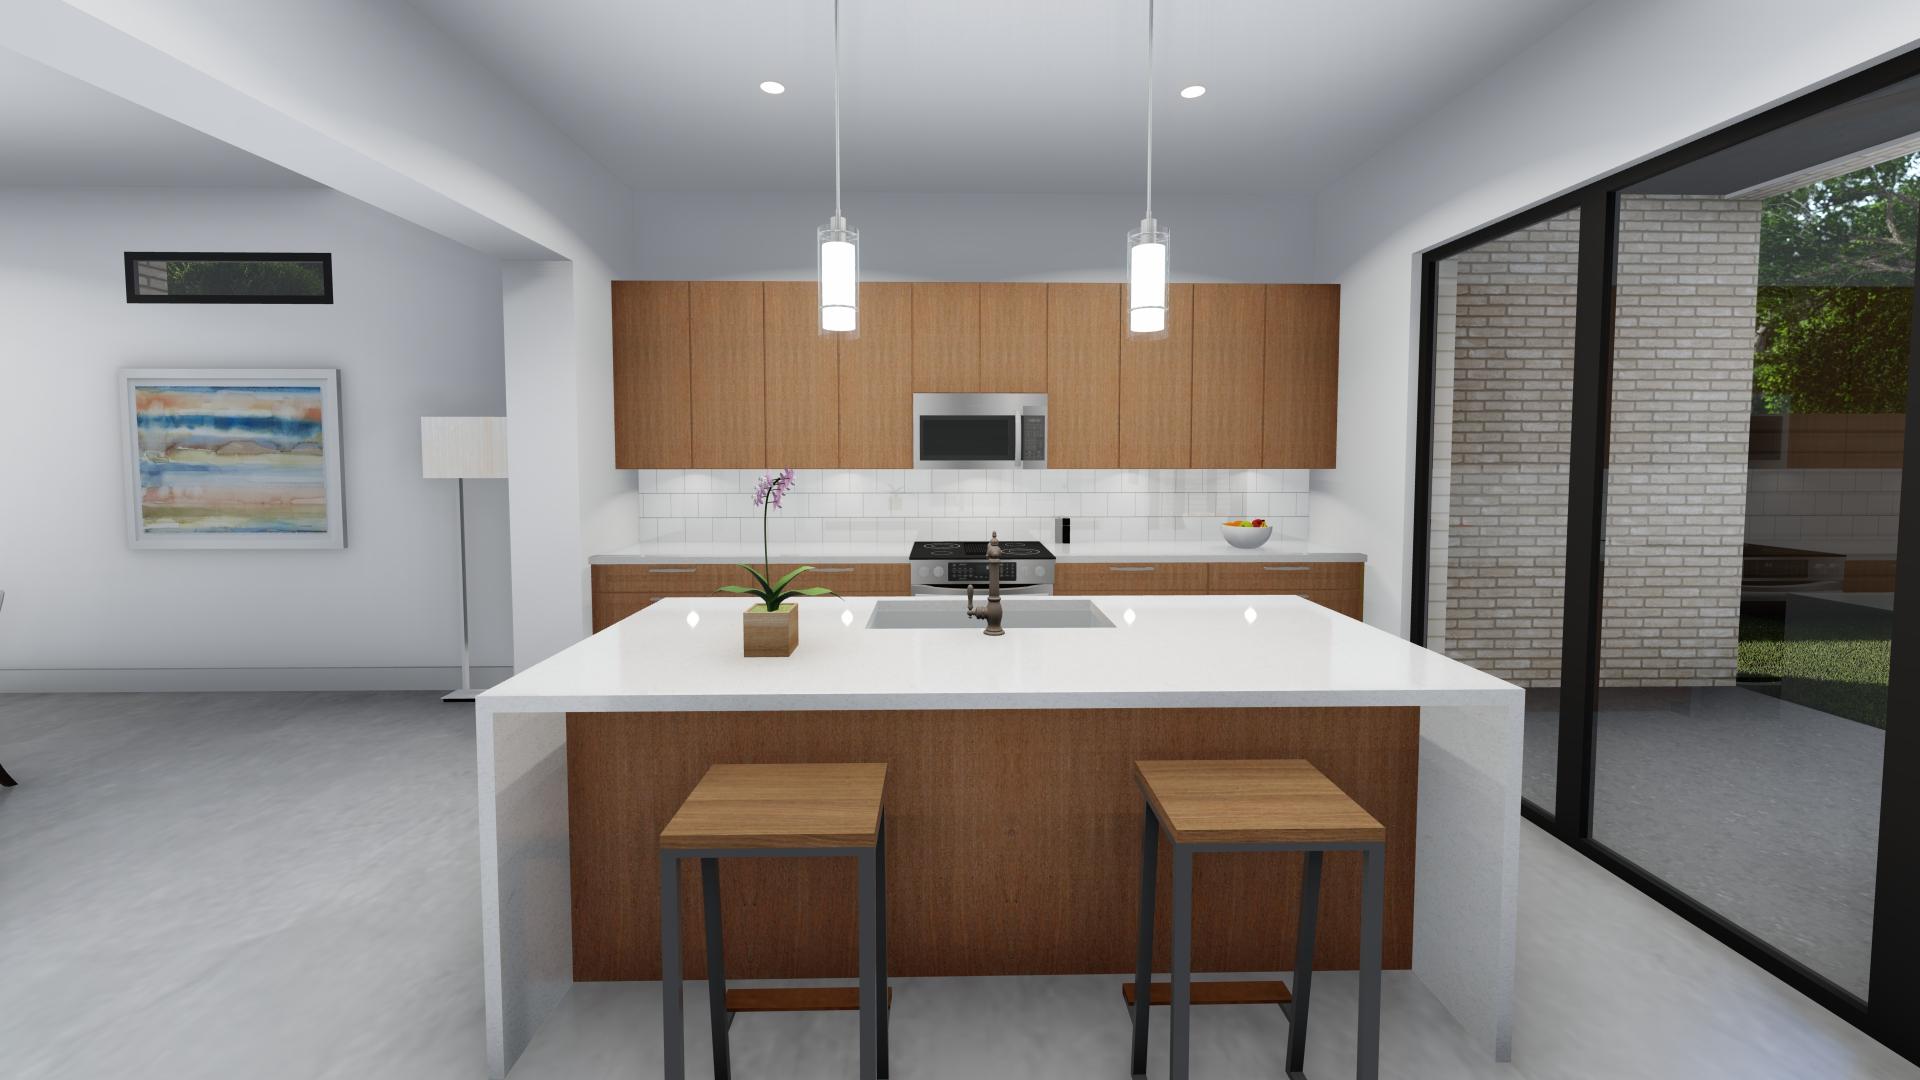 New Wayside interior rendering_Photo - 8.jpg